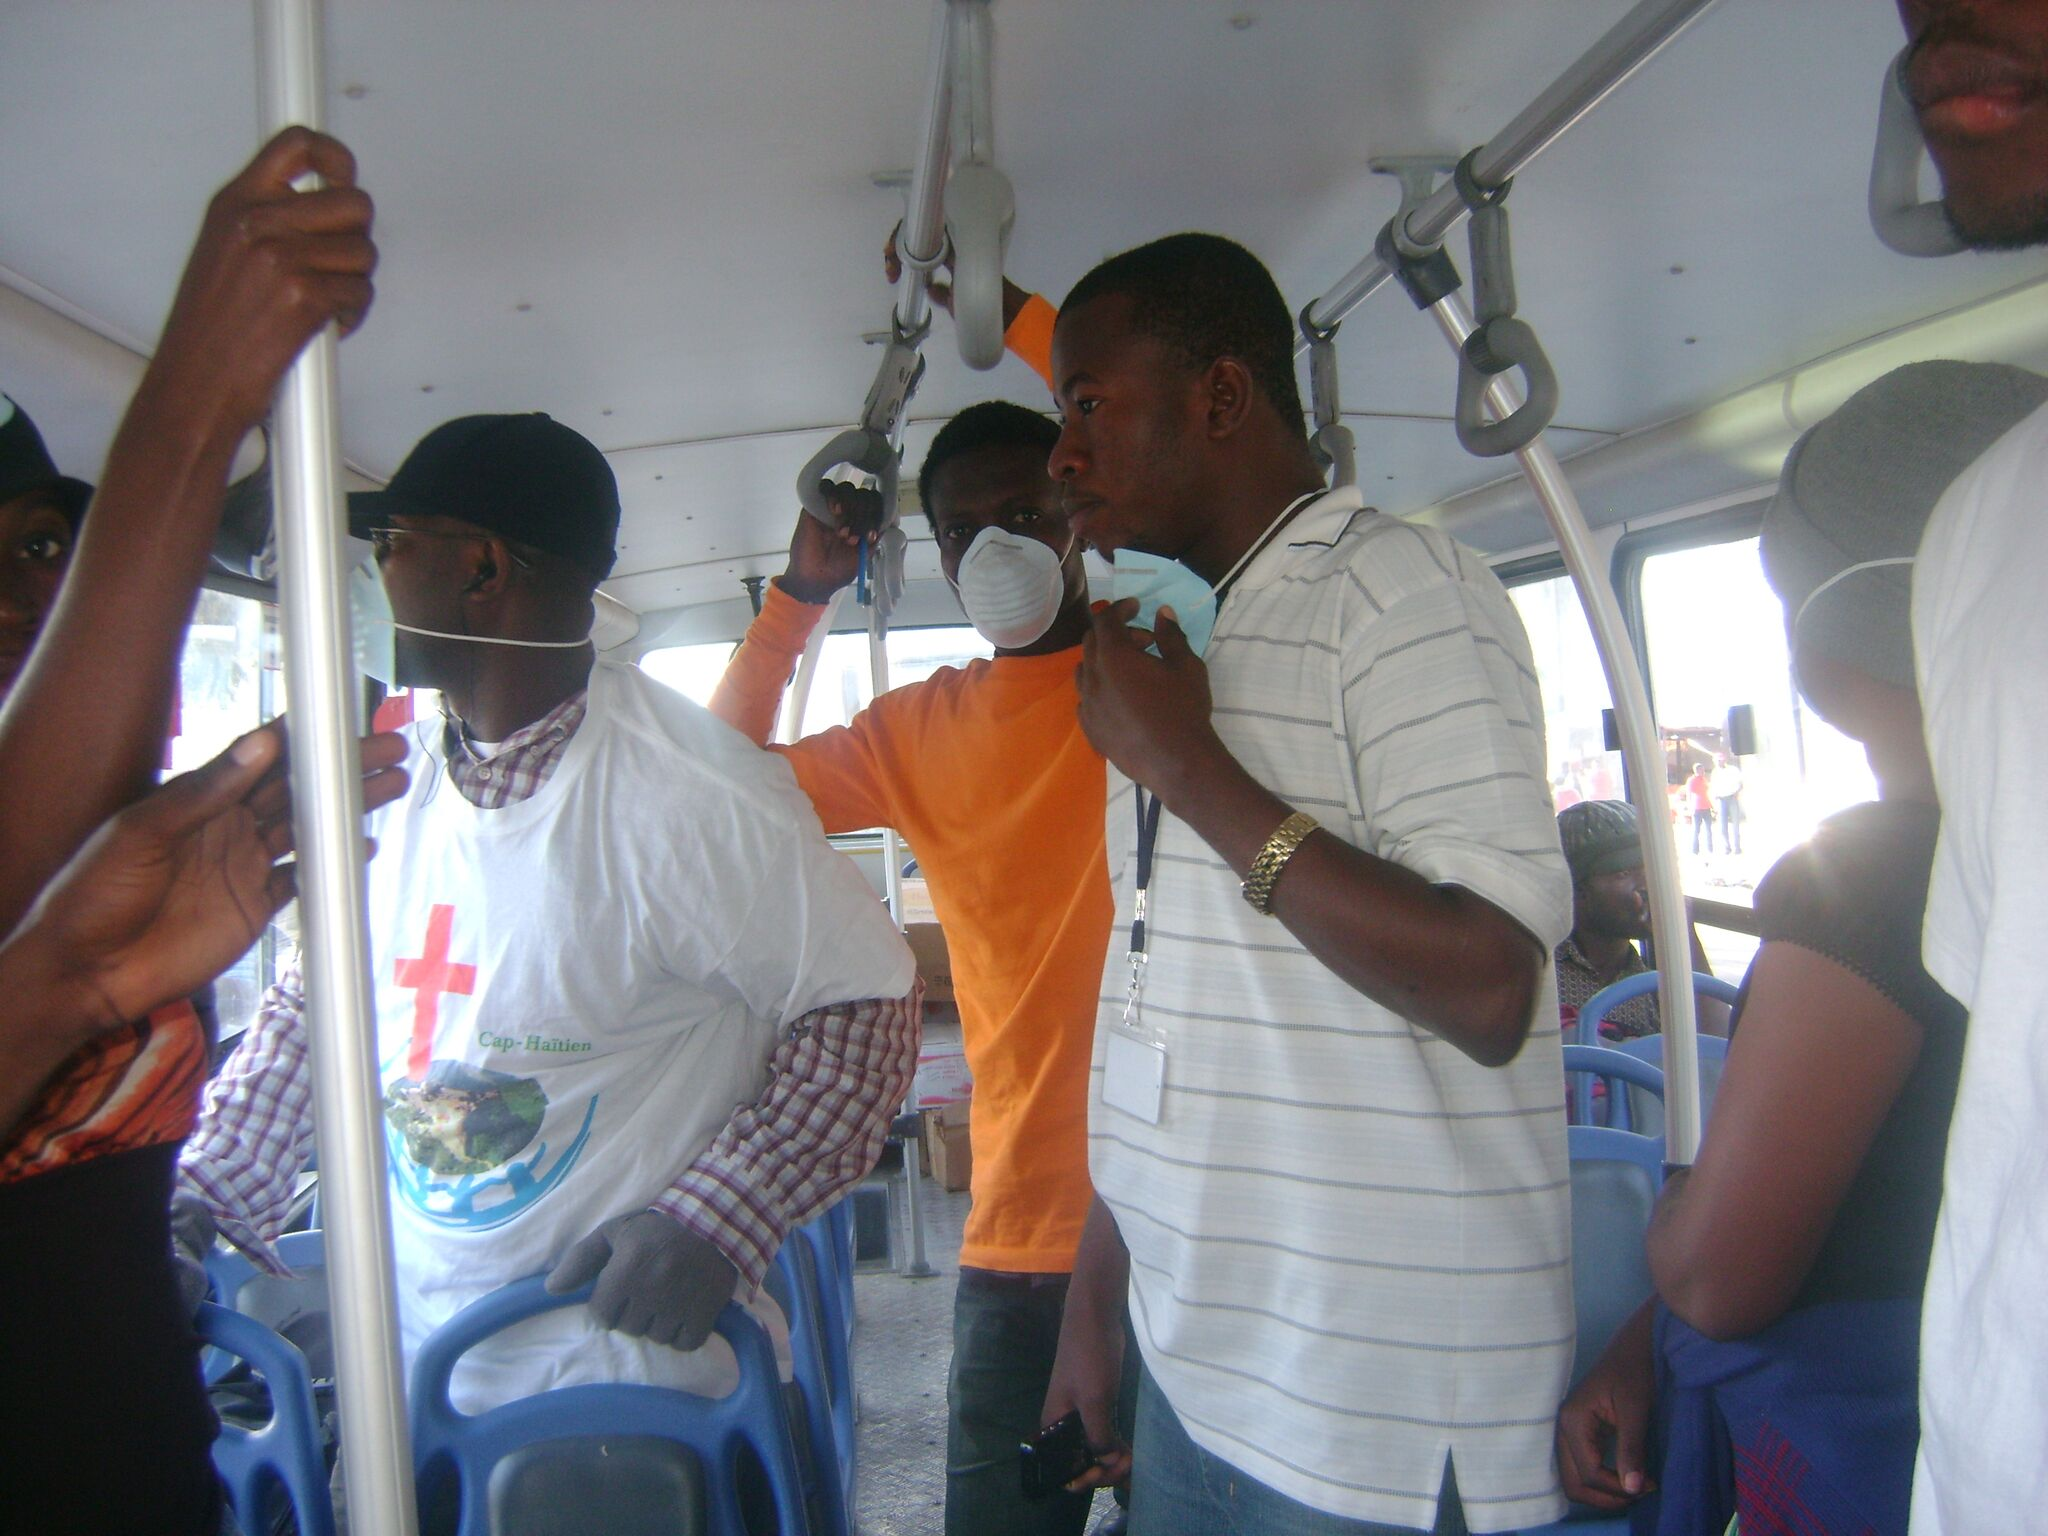 GROW Haiti volunteers participate in post-earthquake emergency response.